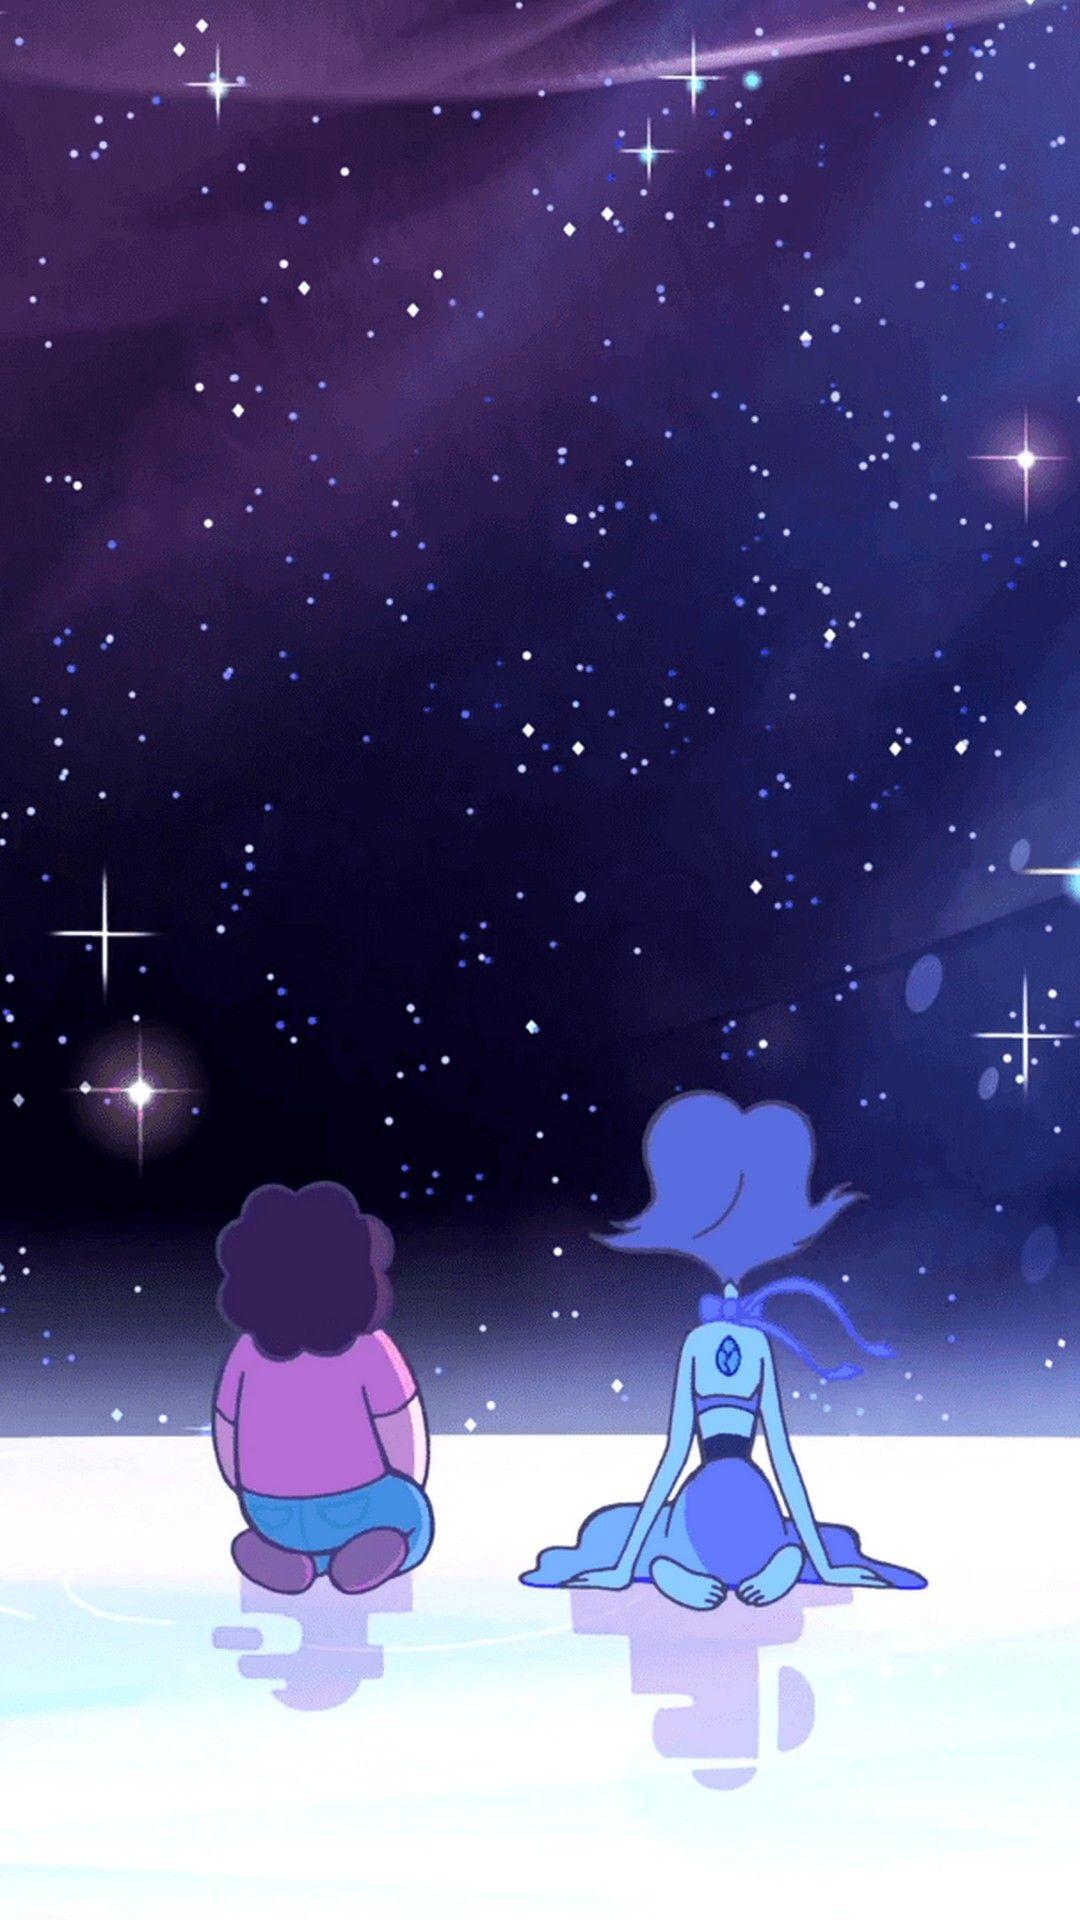 Universe Image in 2020 Steven universe wallpaper, Steven